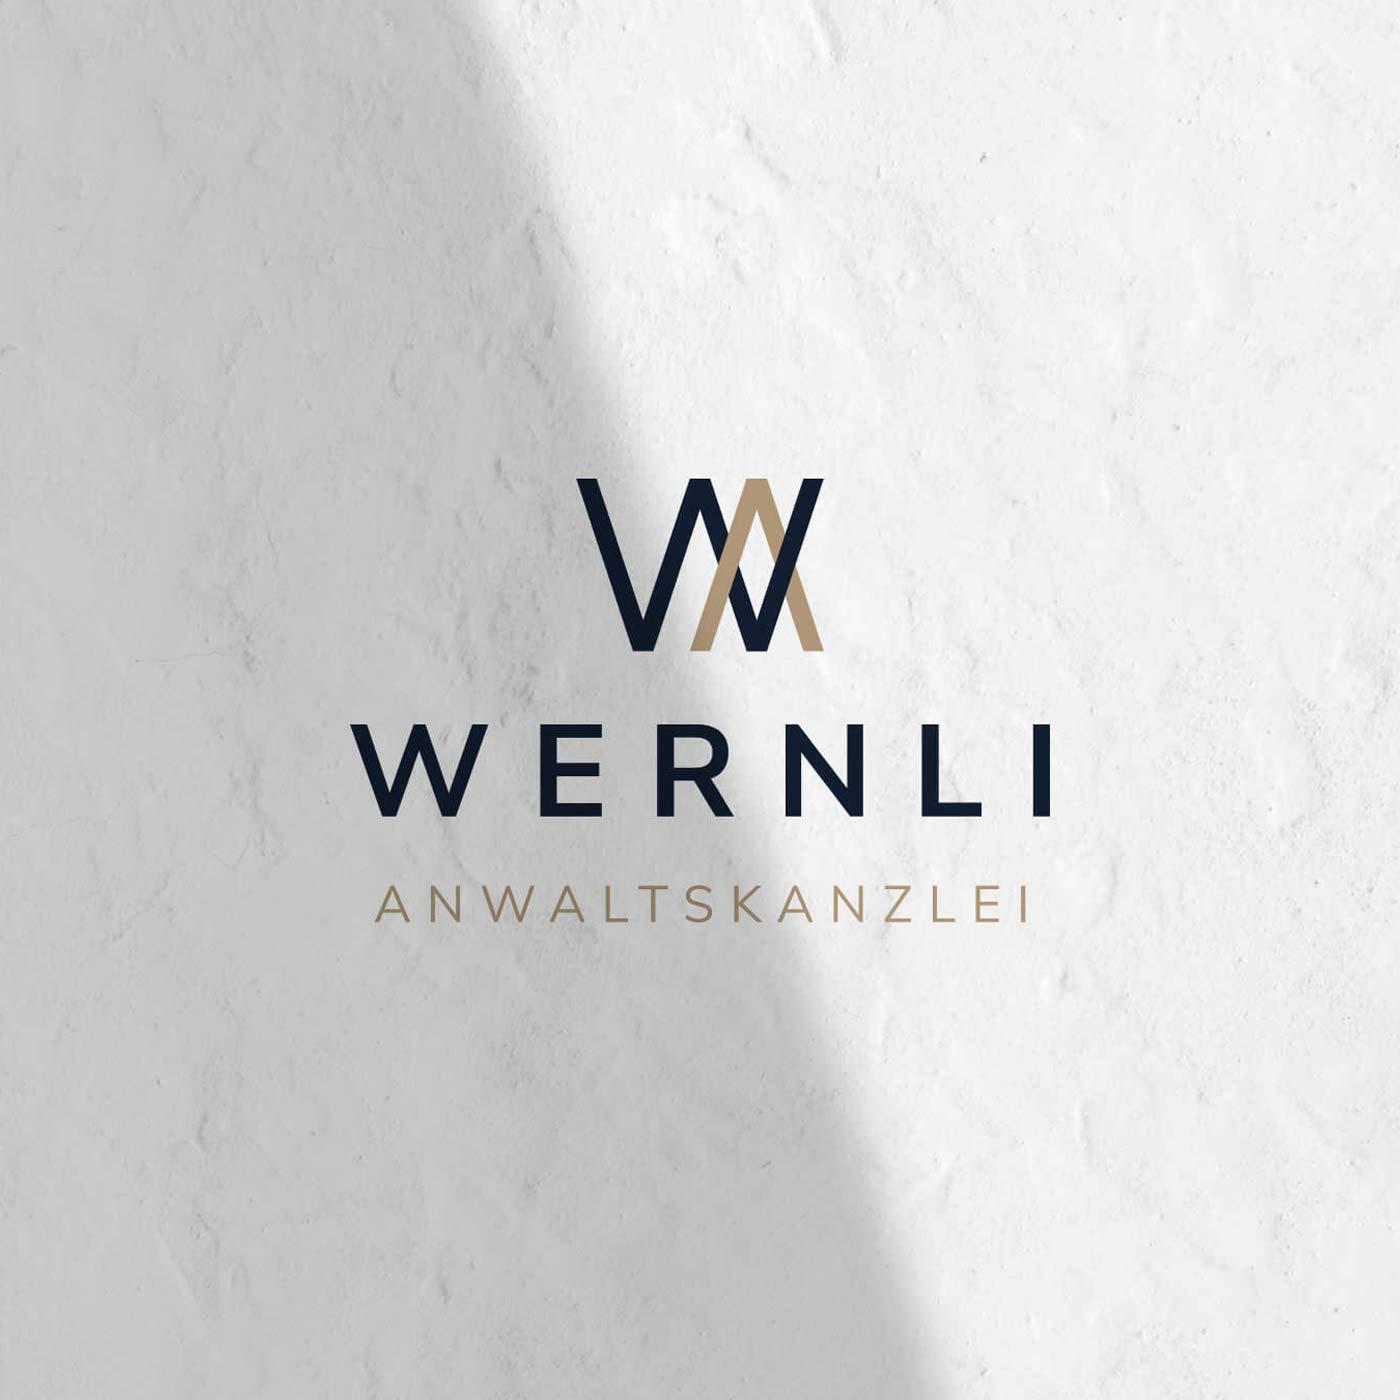 Logo Anwaltskanzlei Schweiz